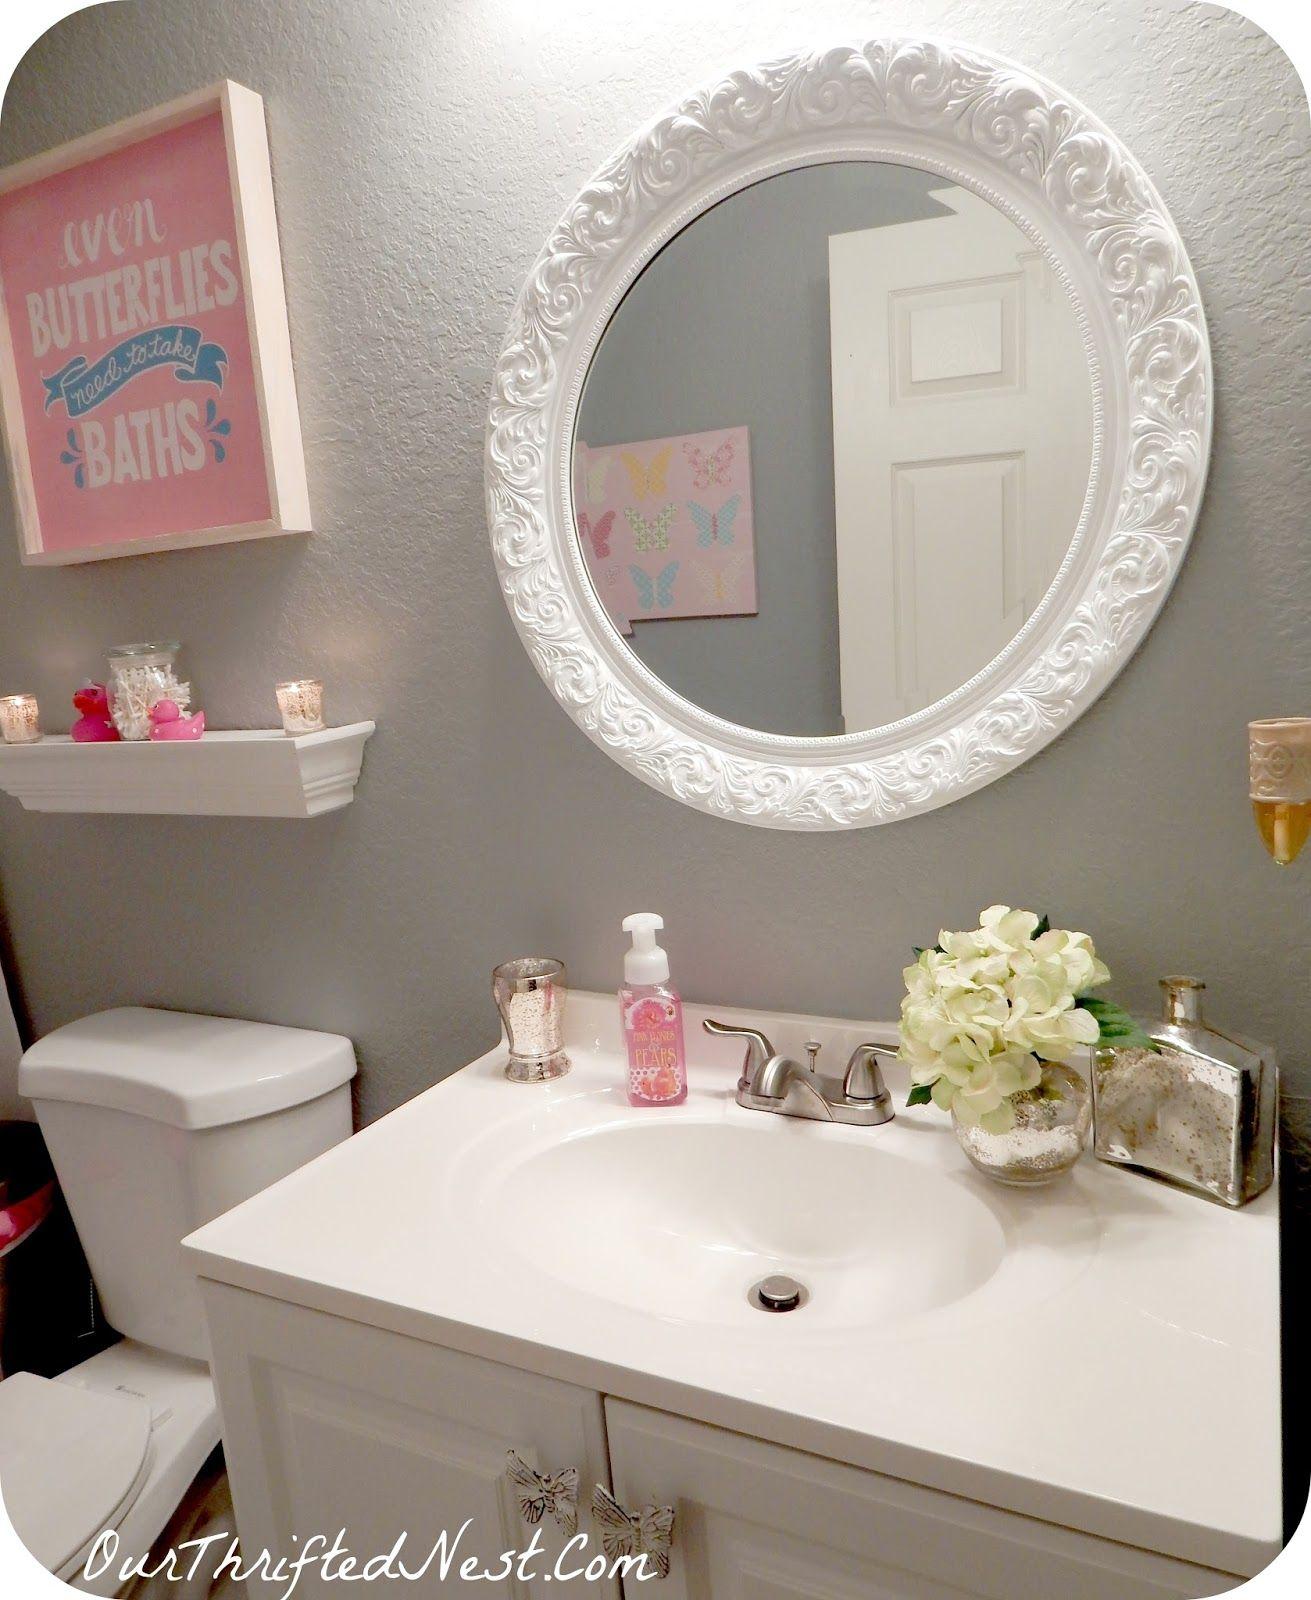 Best Wall Paint For Bathroom: Bathroom Decor: White Vintage Round Wall Mirror, Valspar